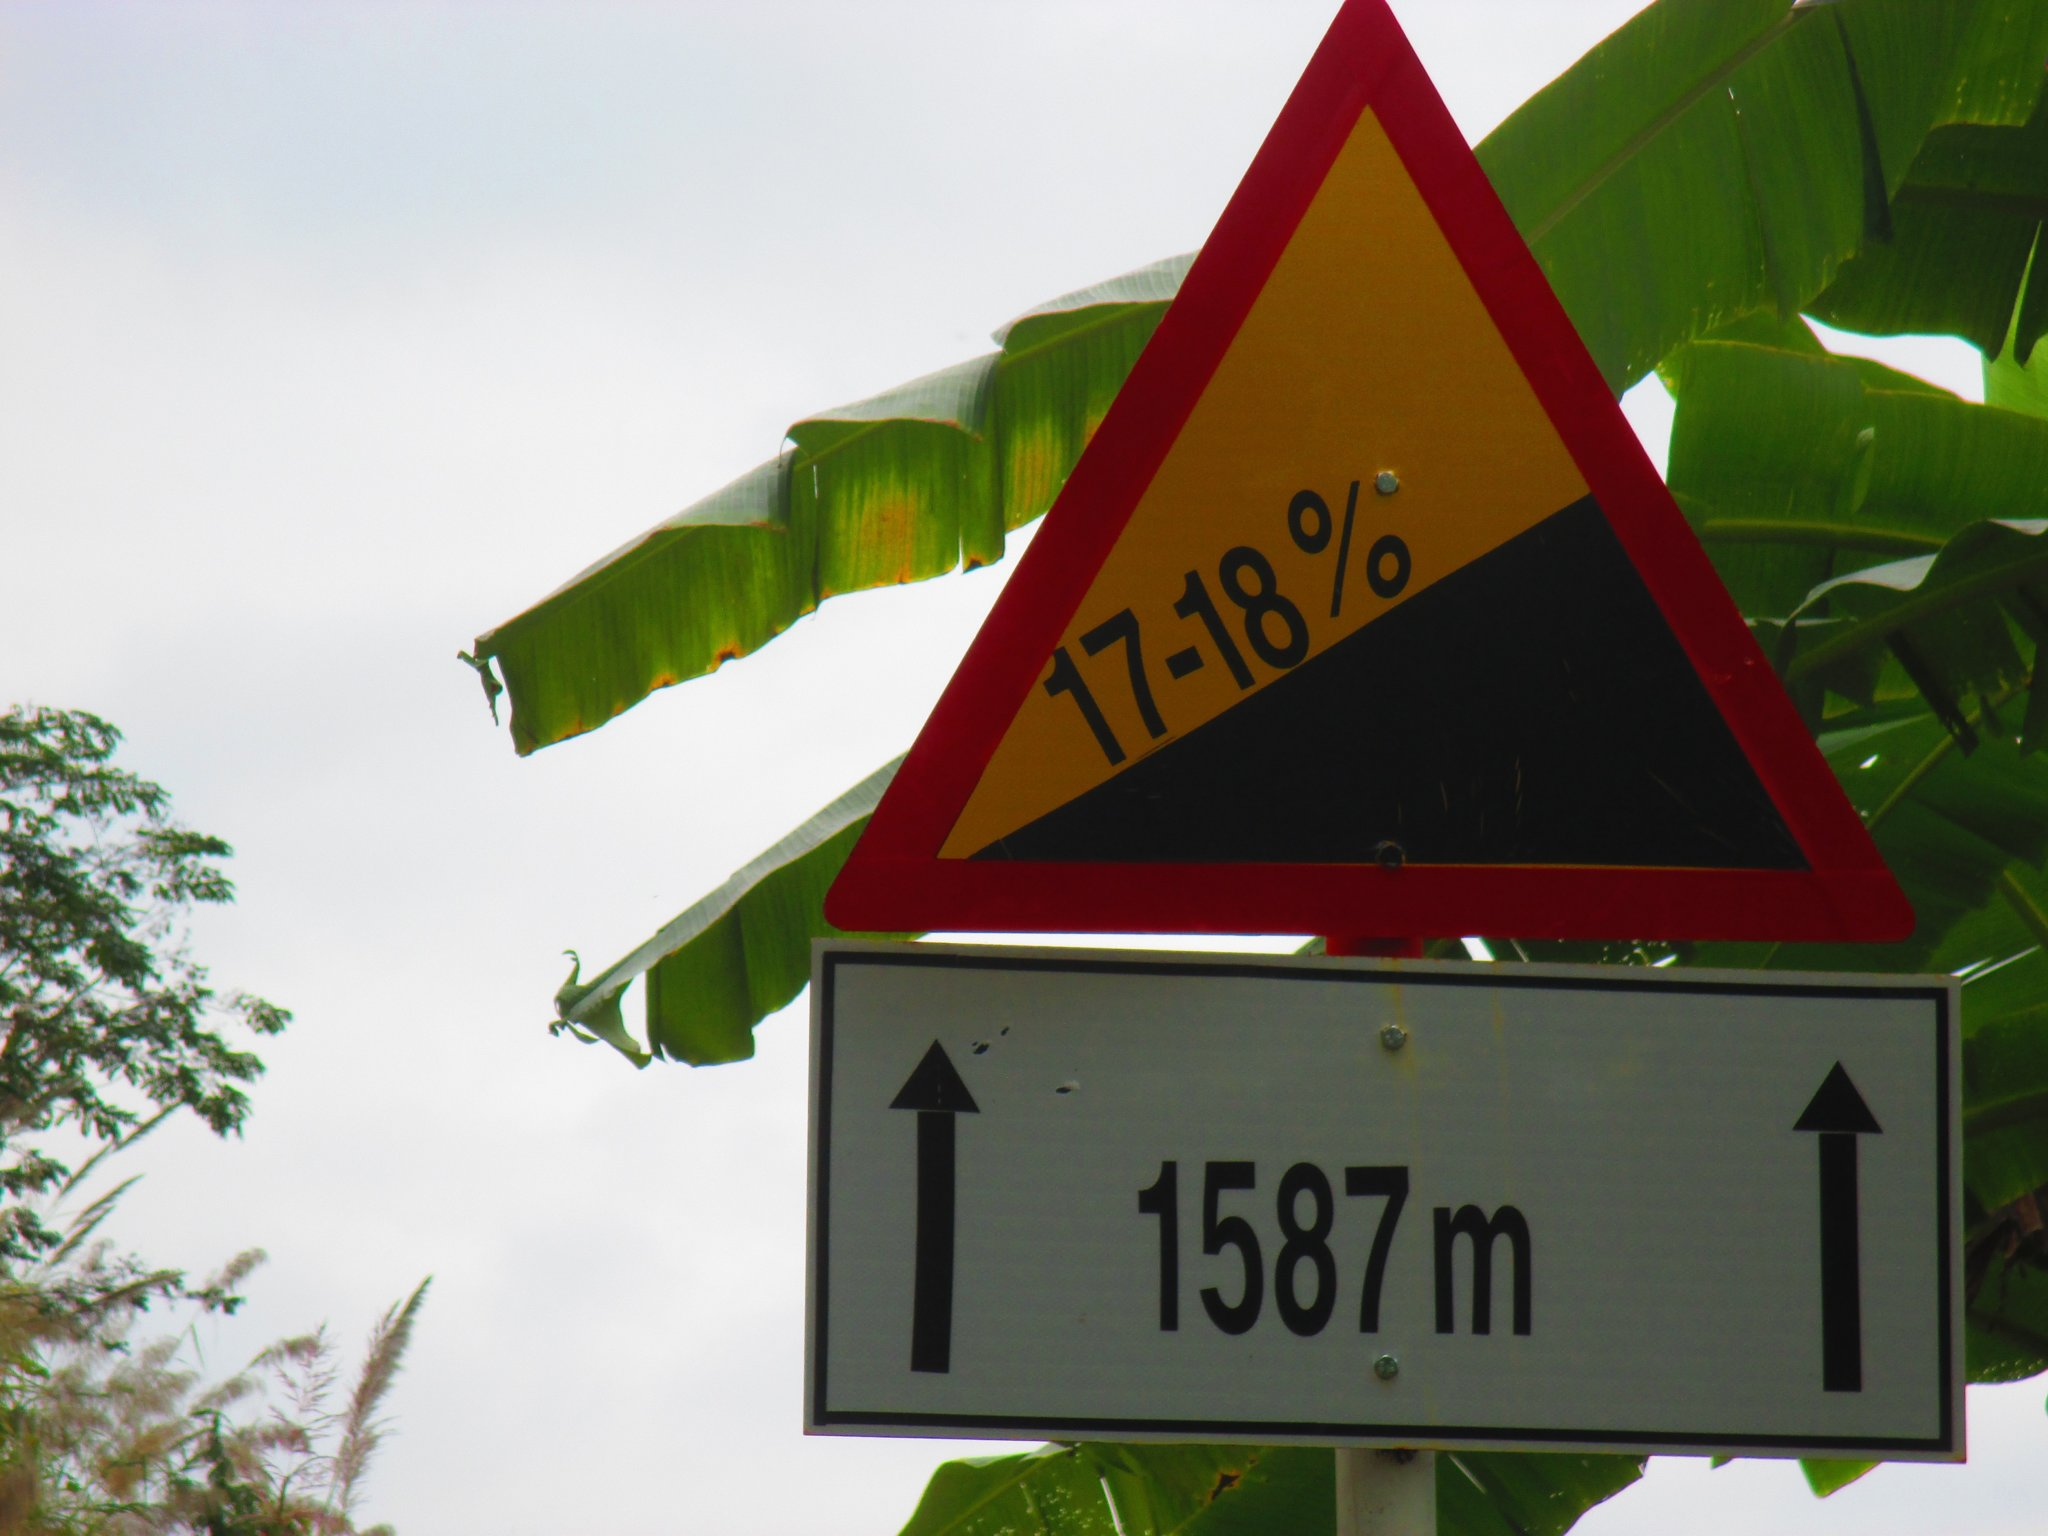 IMG_1352.JPG